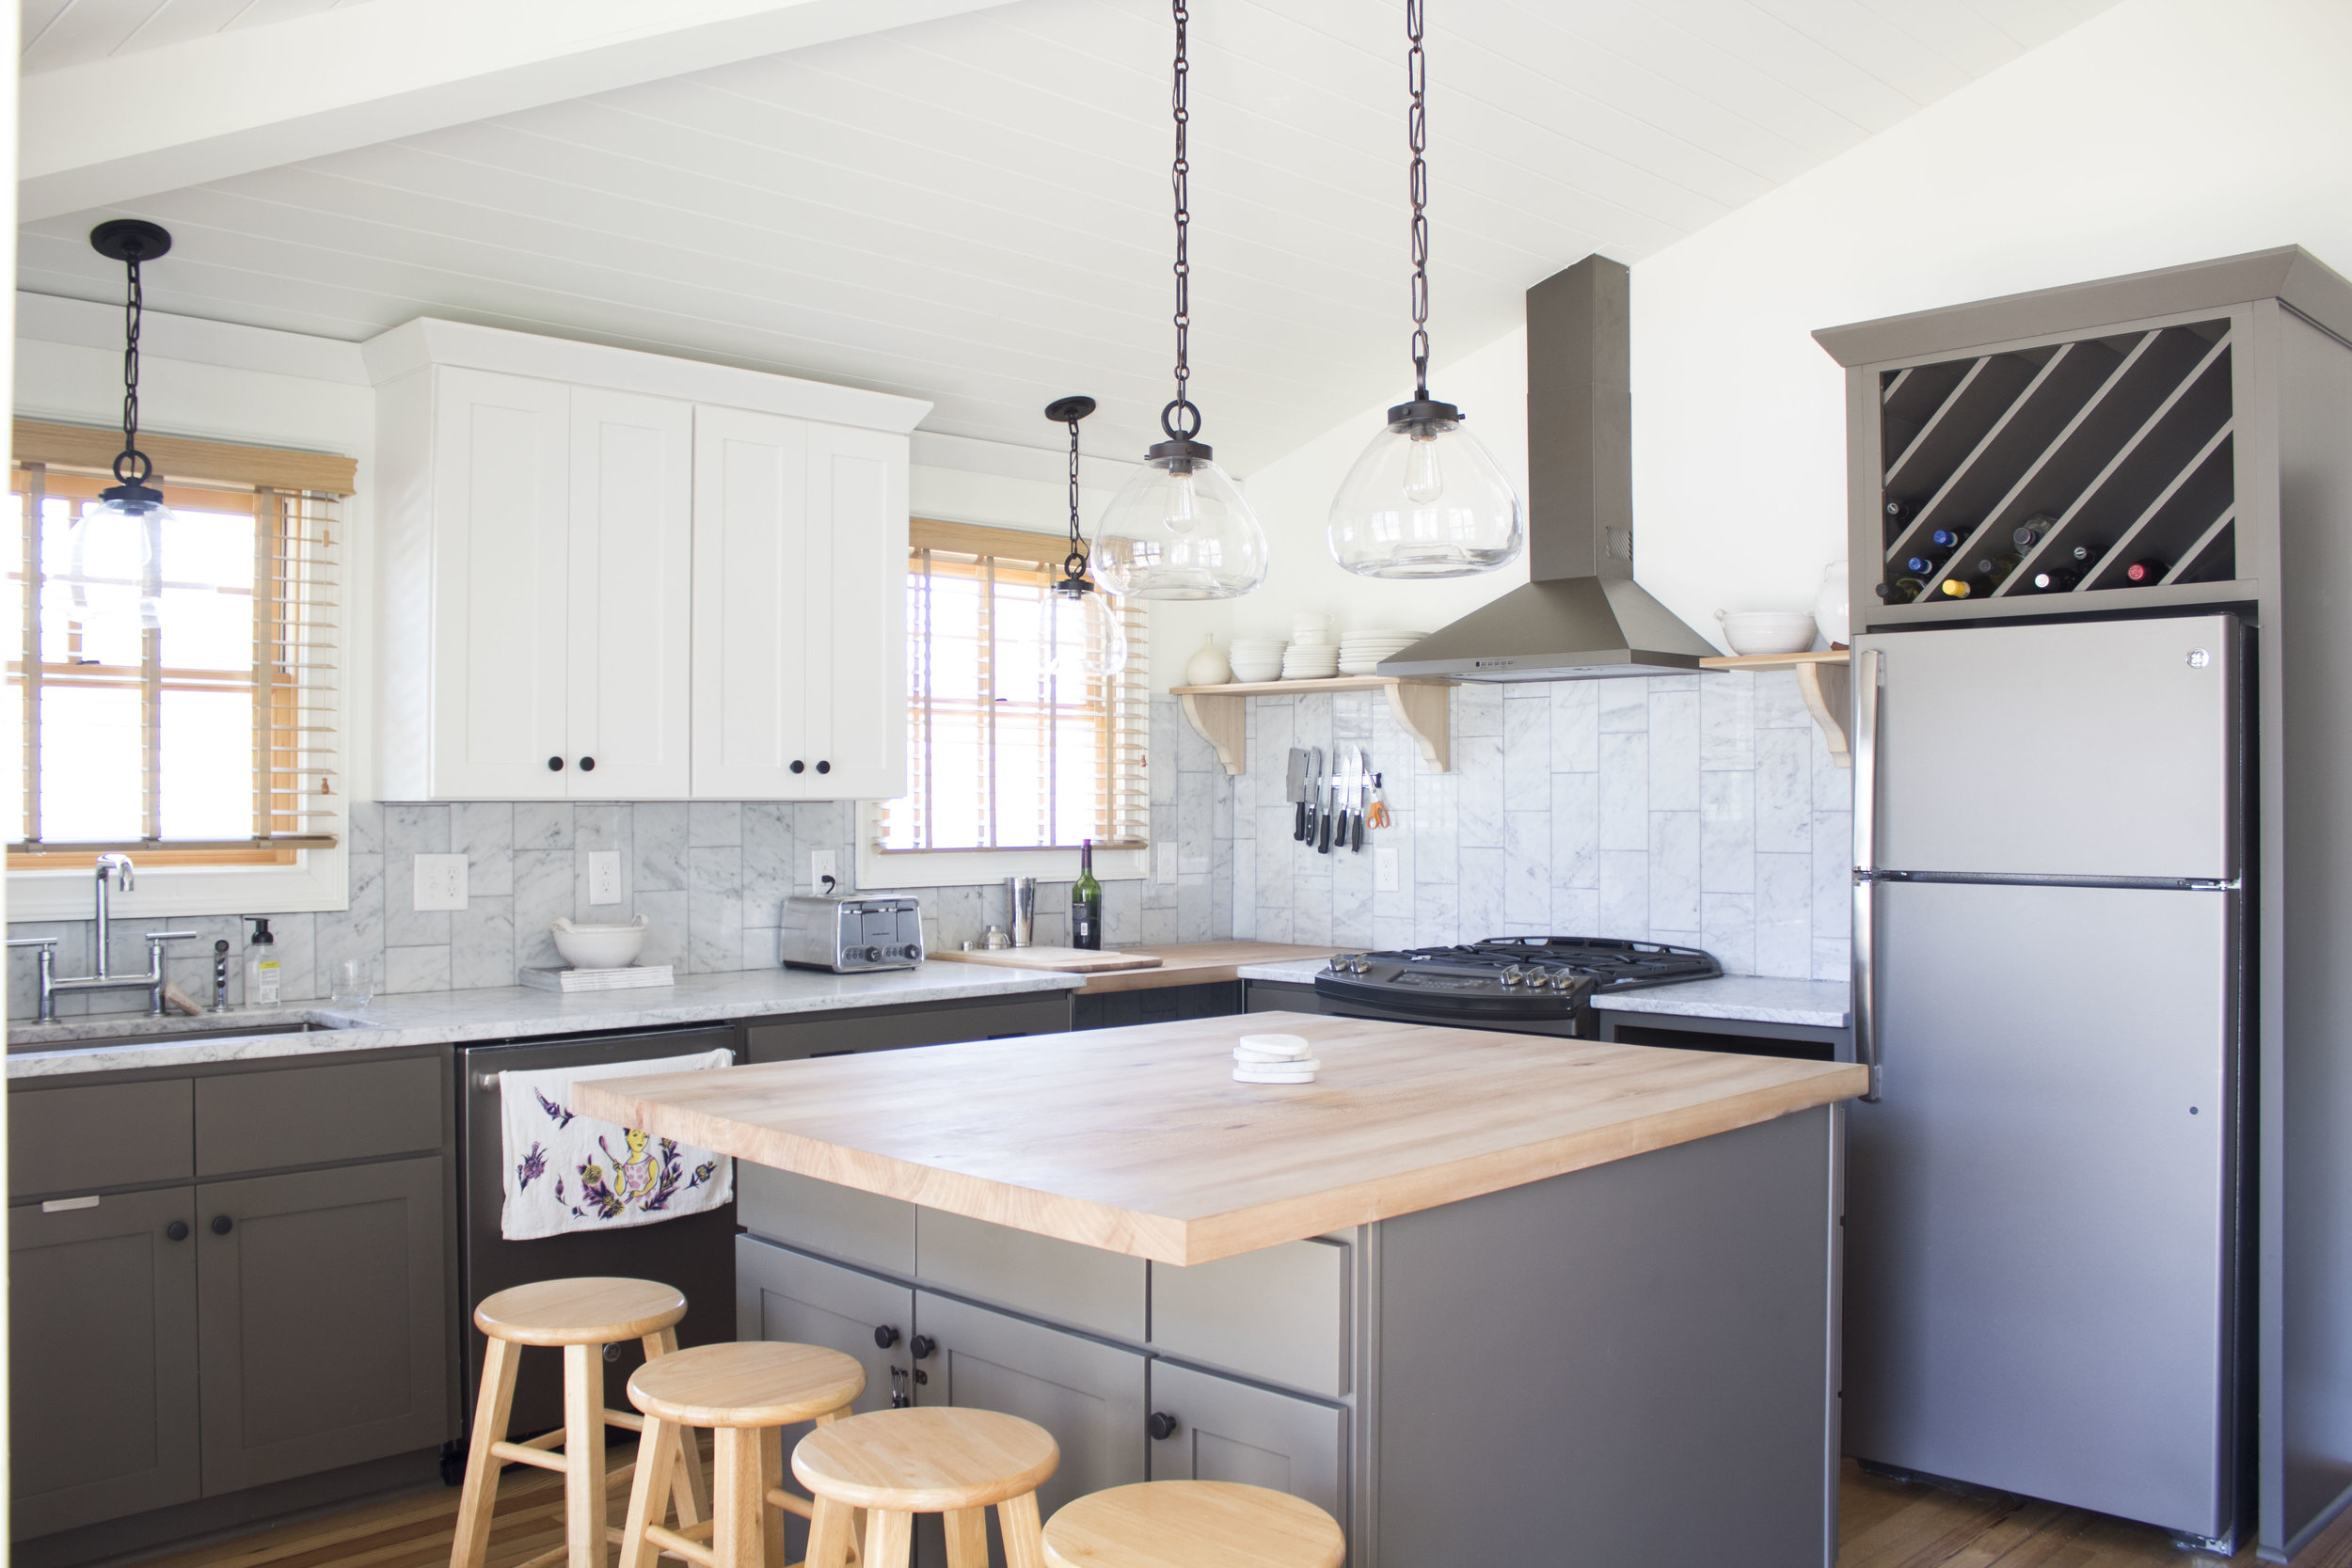 Carolina_Beach_kitchen_remodel.jpg